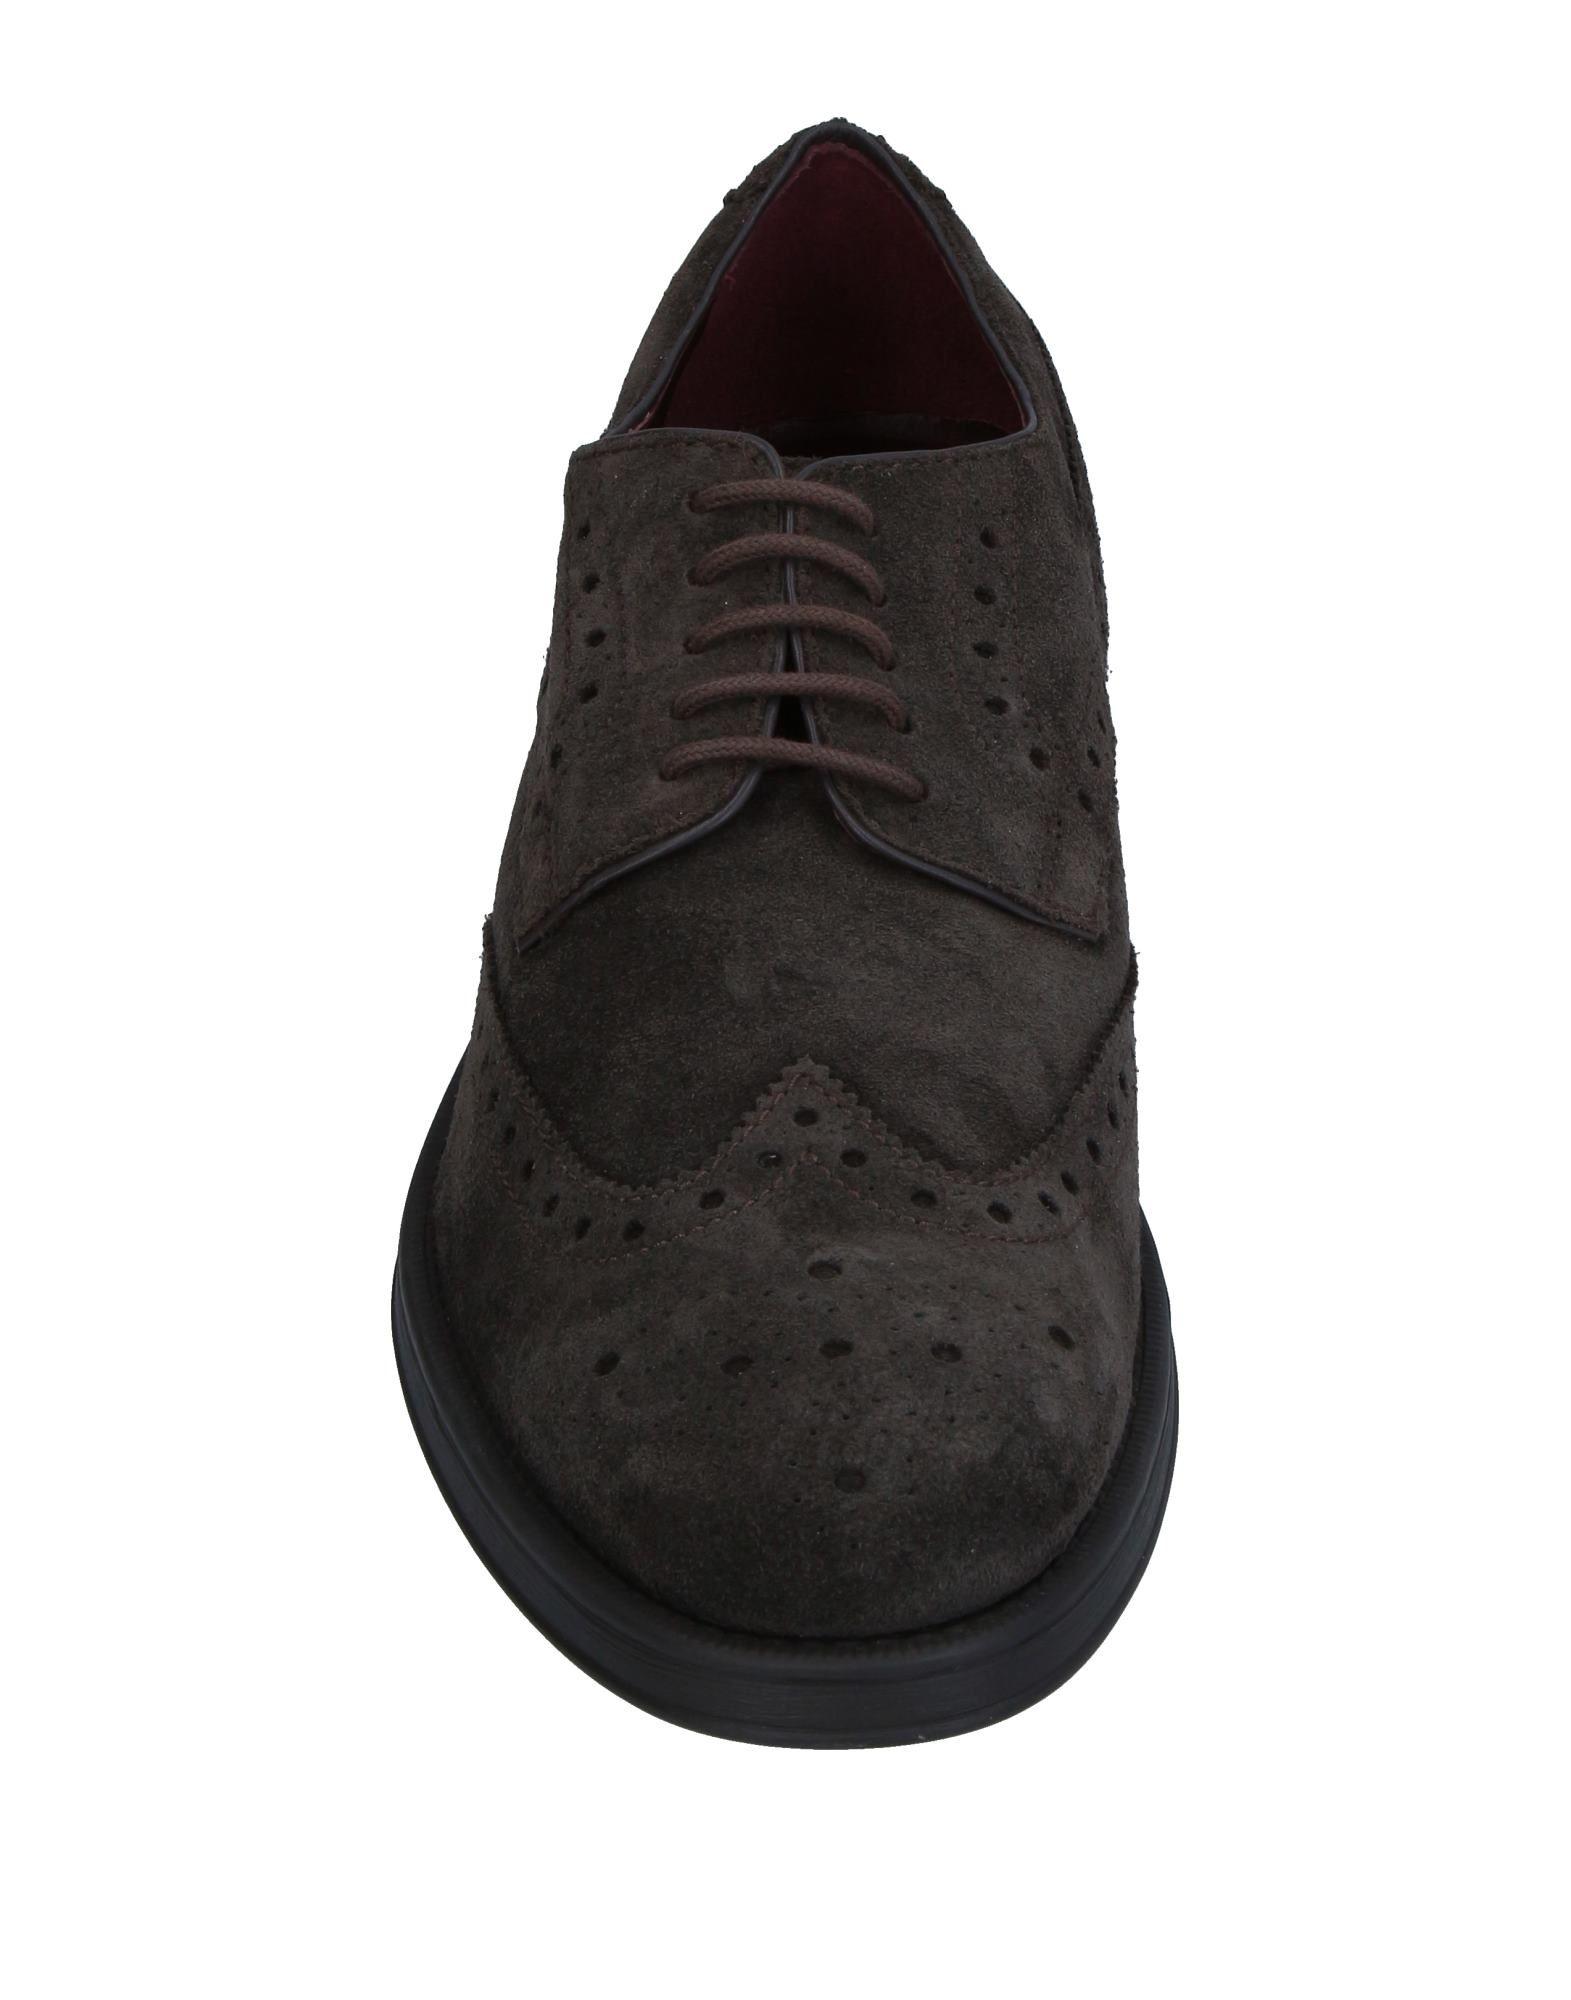 Rabatt echte  Schuhe Geox Schnürschuhe Herren  echte 11324930LB 5d6c82